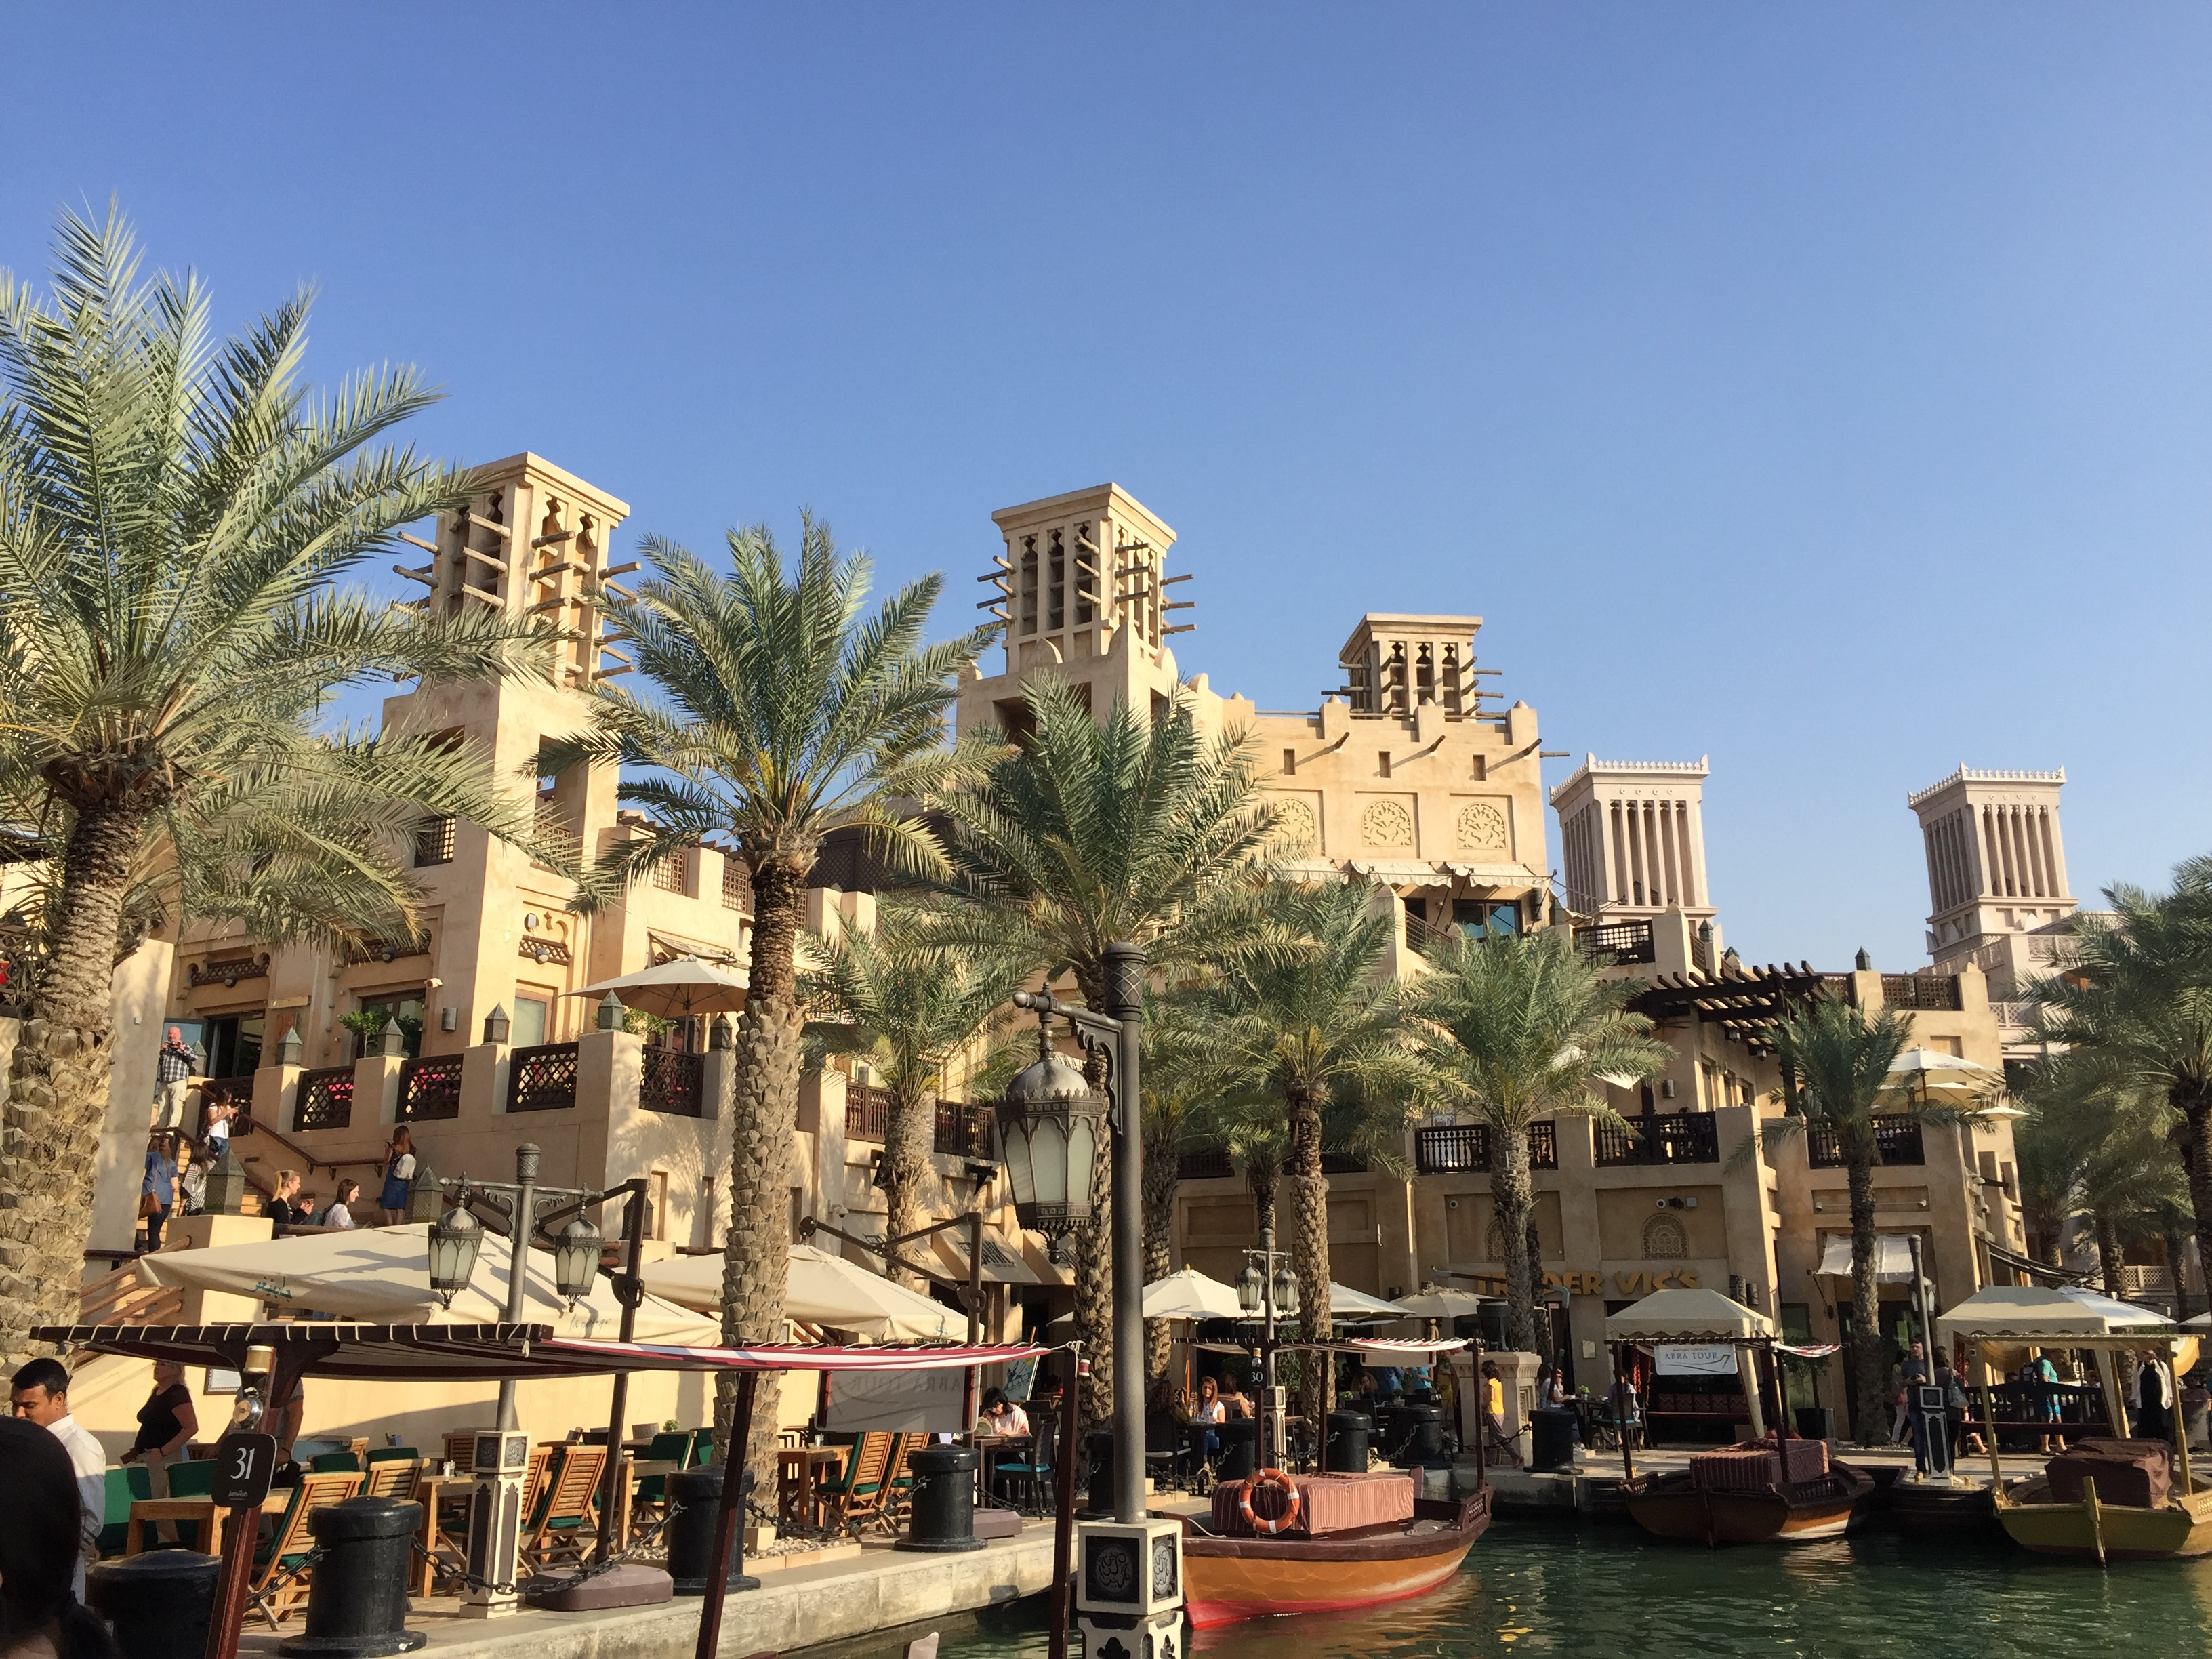 Abu Dhabi dating scene